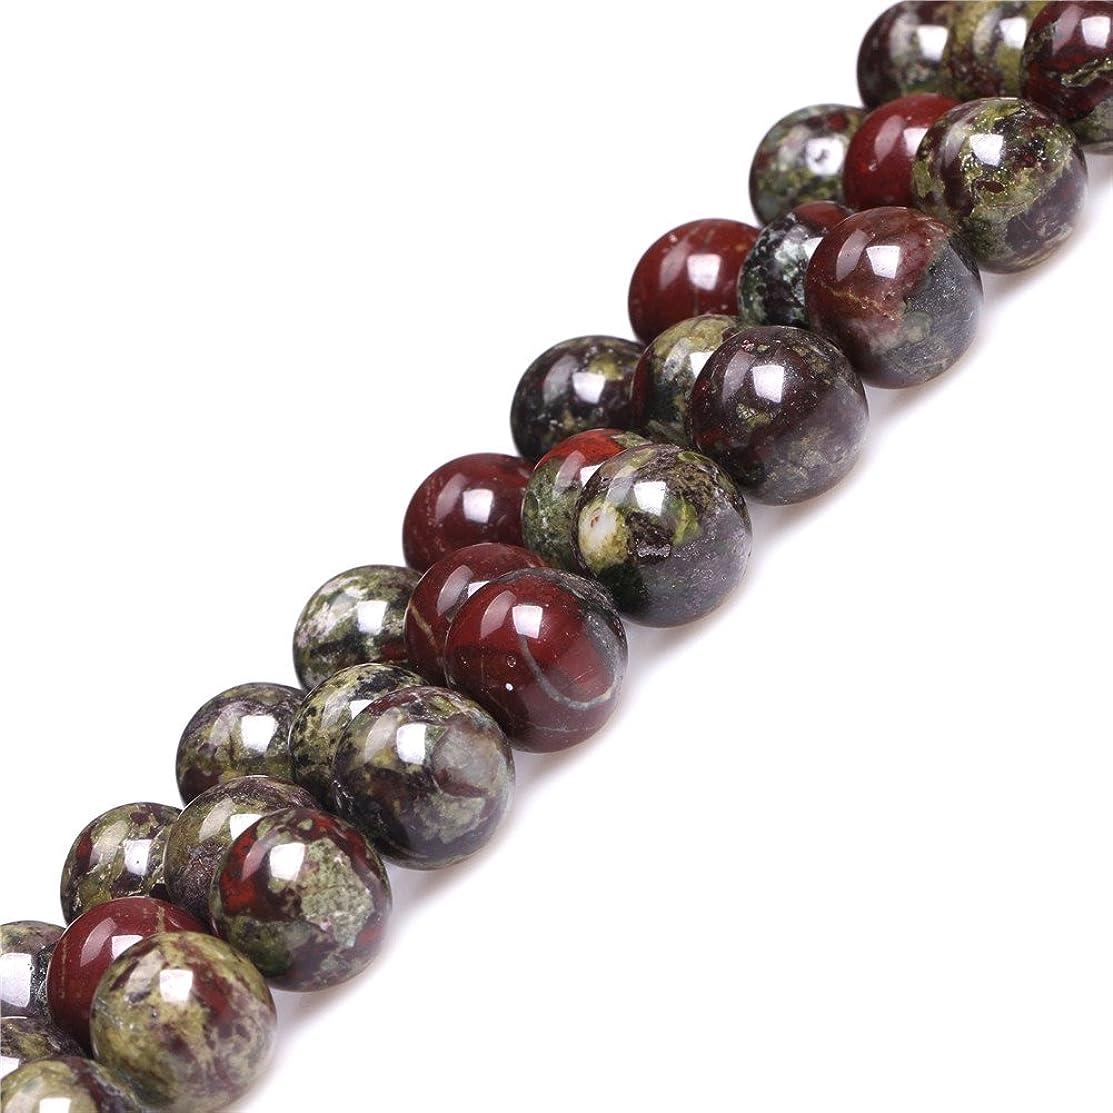 Dragon Blood Jasper Beads for Jewelry Making Natural Gemstone Semi Precious 12mm A Grade Dark Green Round 15